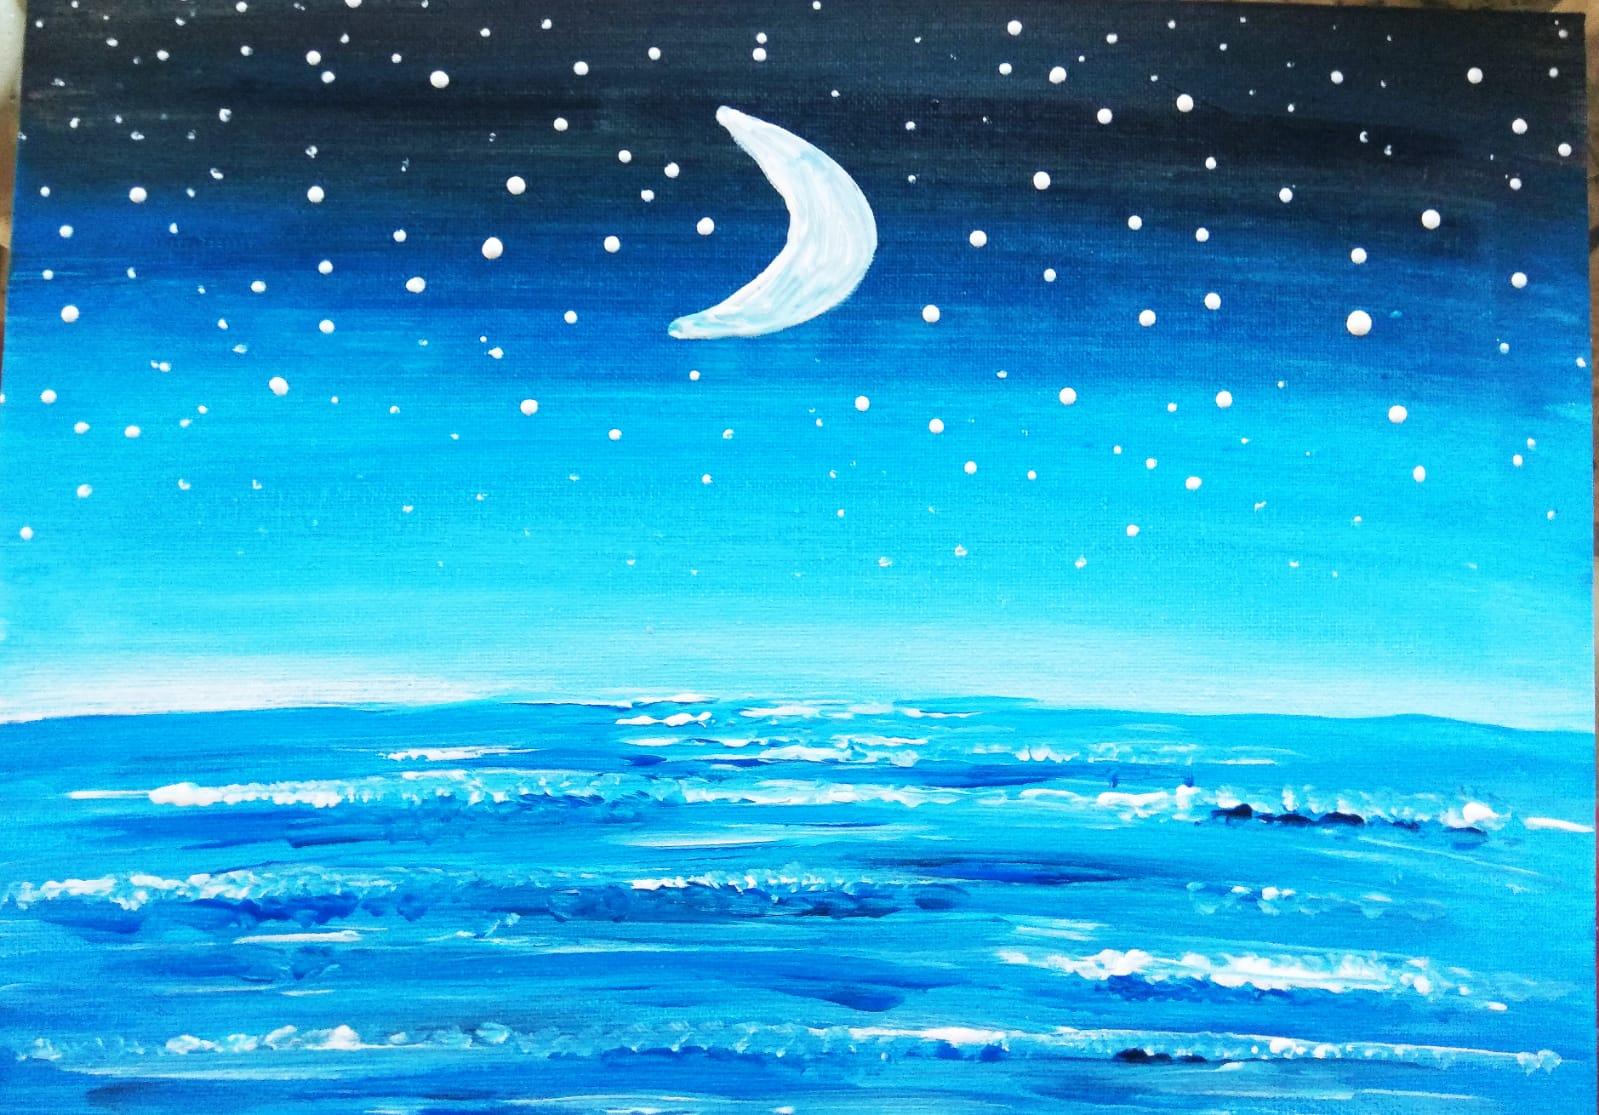 Ocean, Moon, & Stars